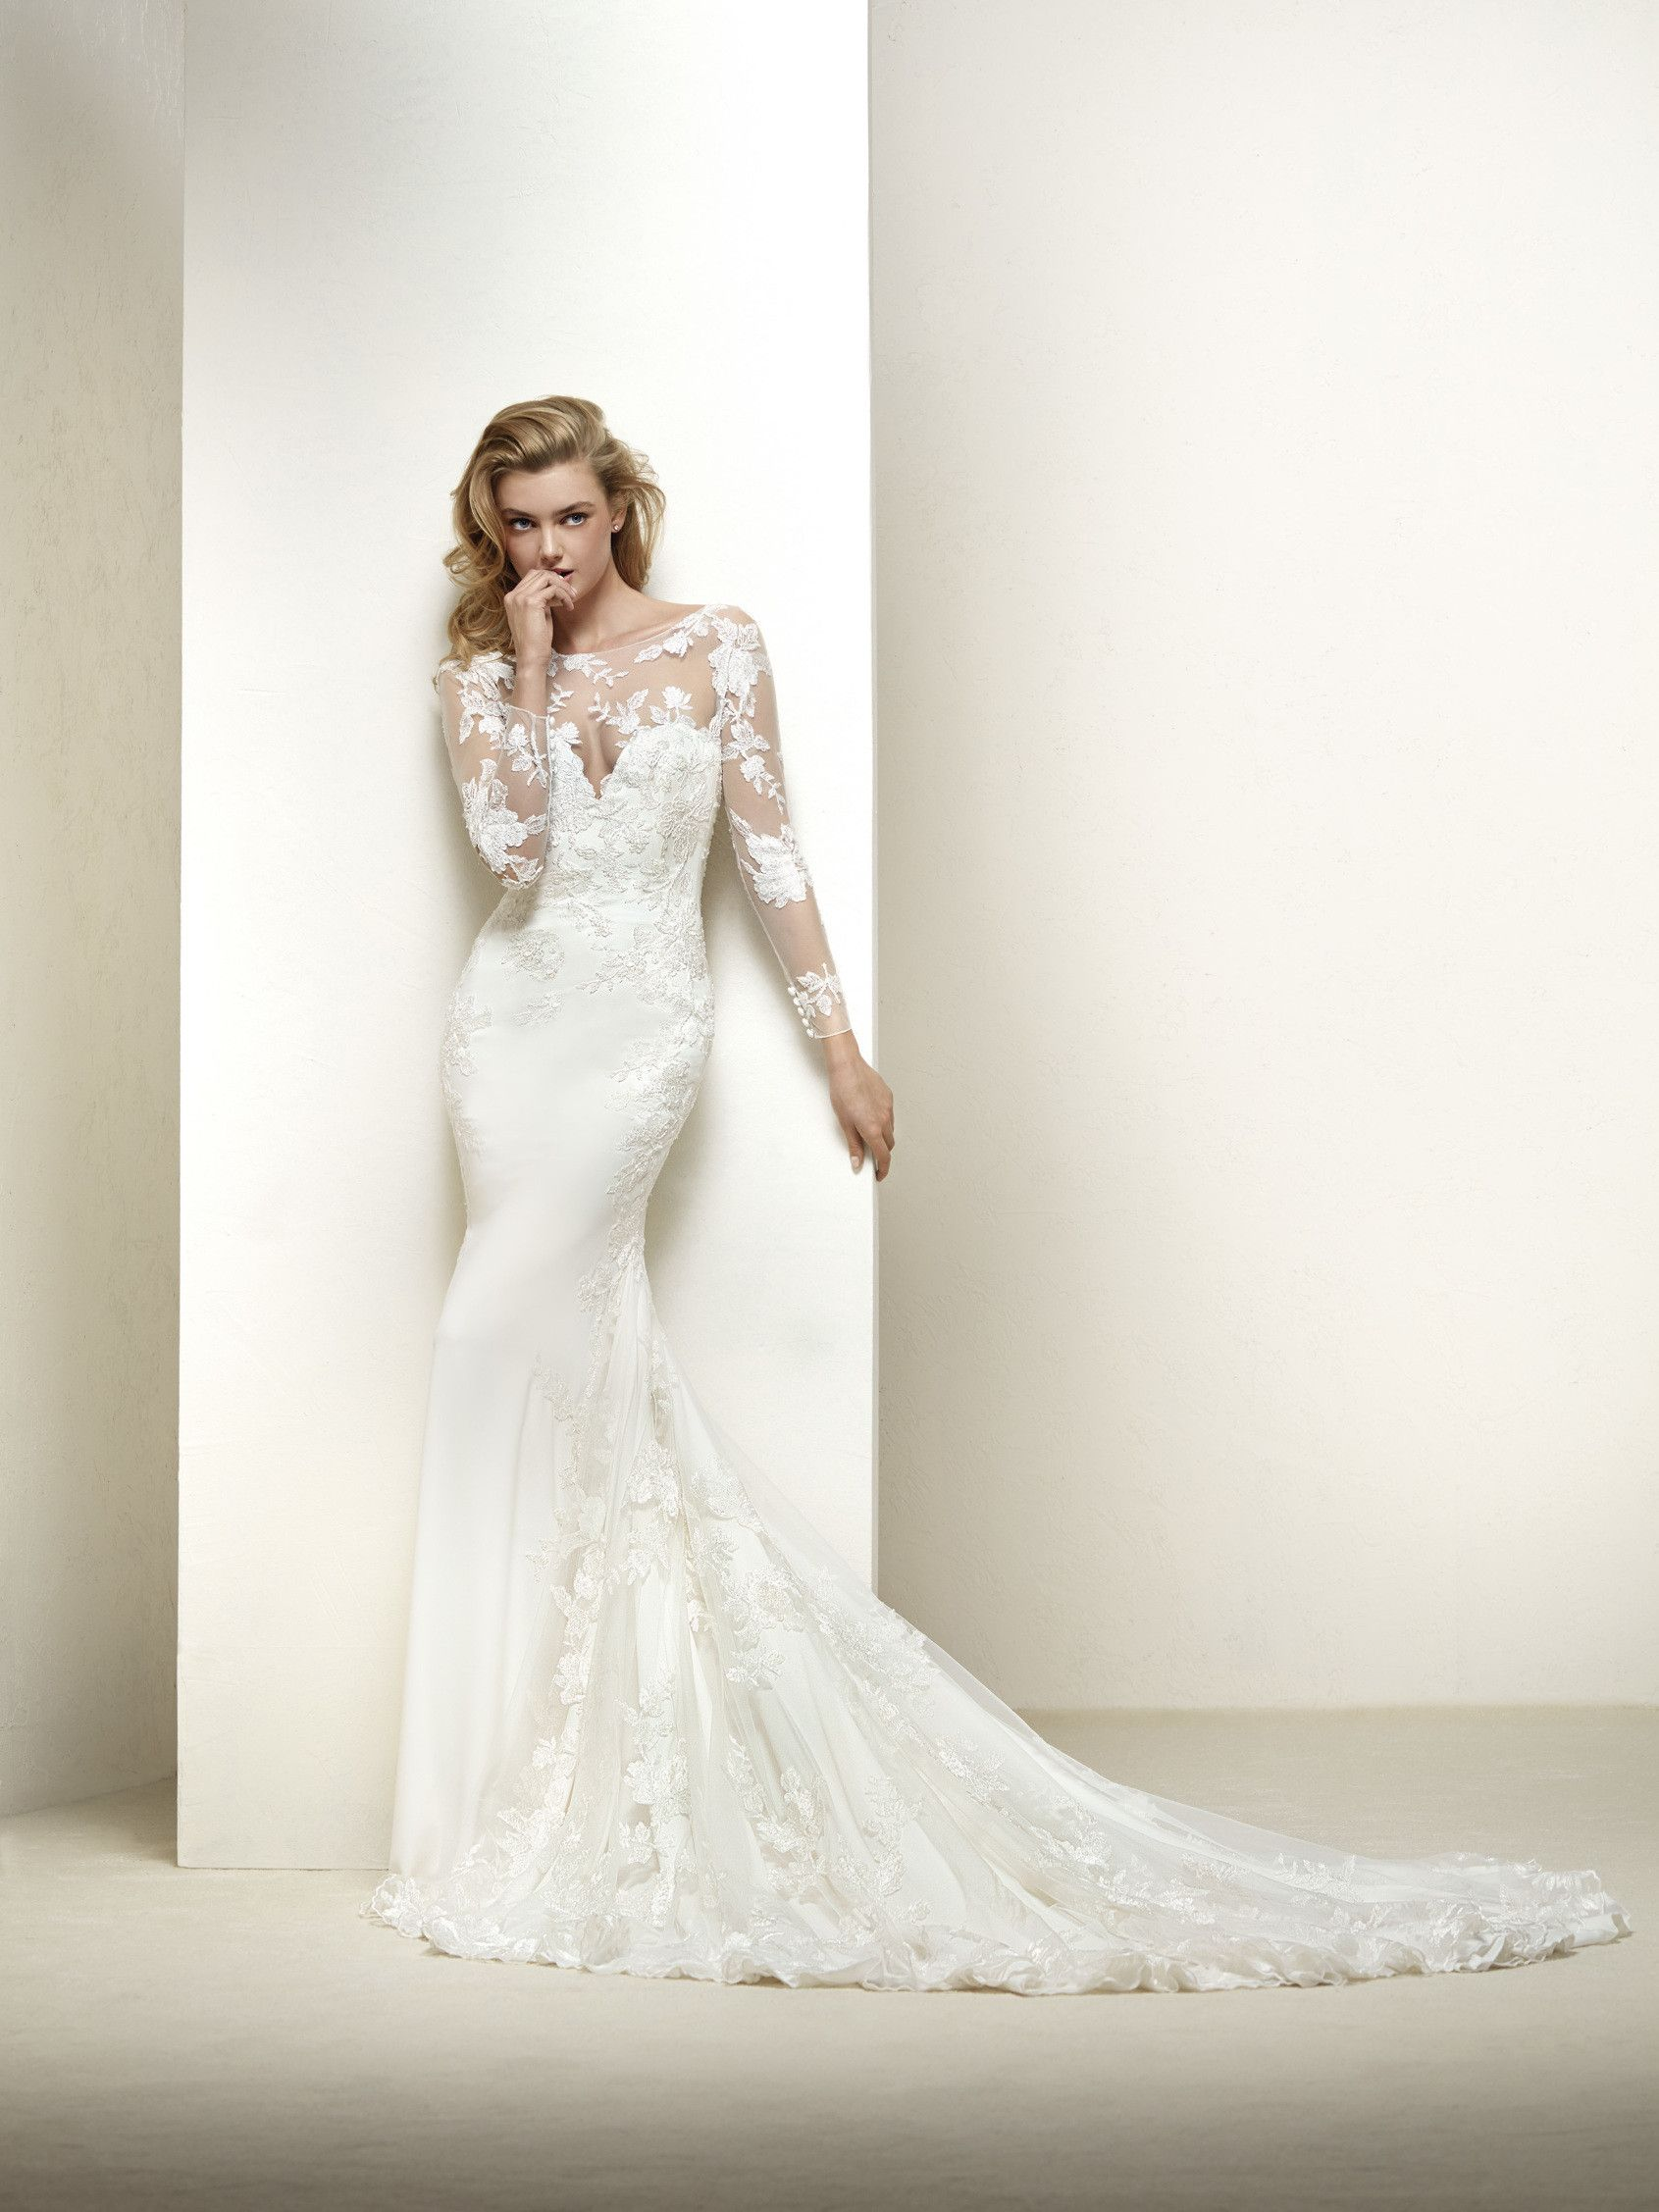 Brautkleid Ausschnitt mit Tüllpasse - Drakar | Wedding | Pinterest ...